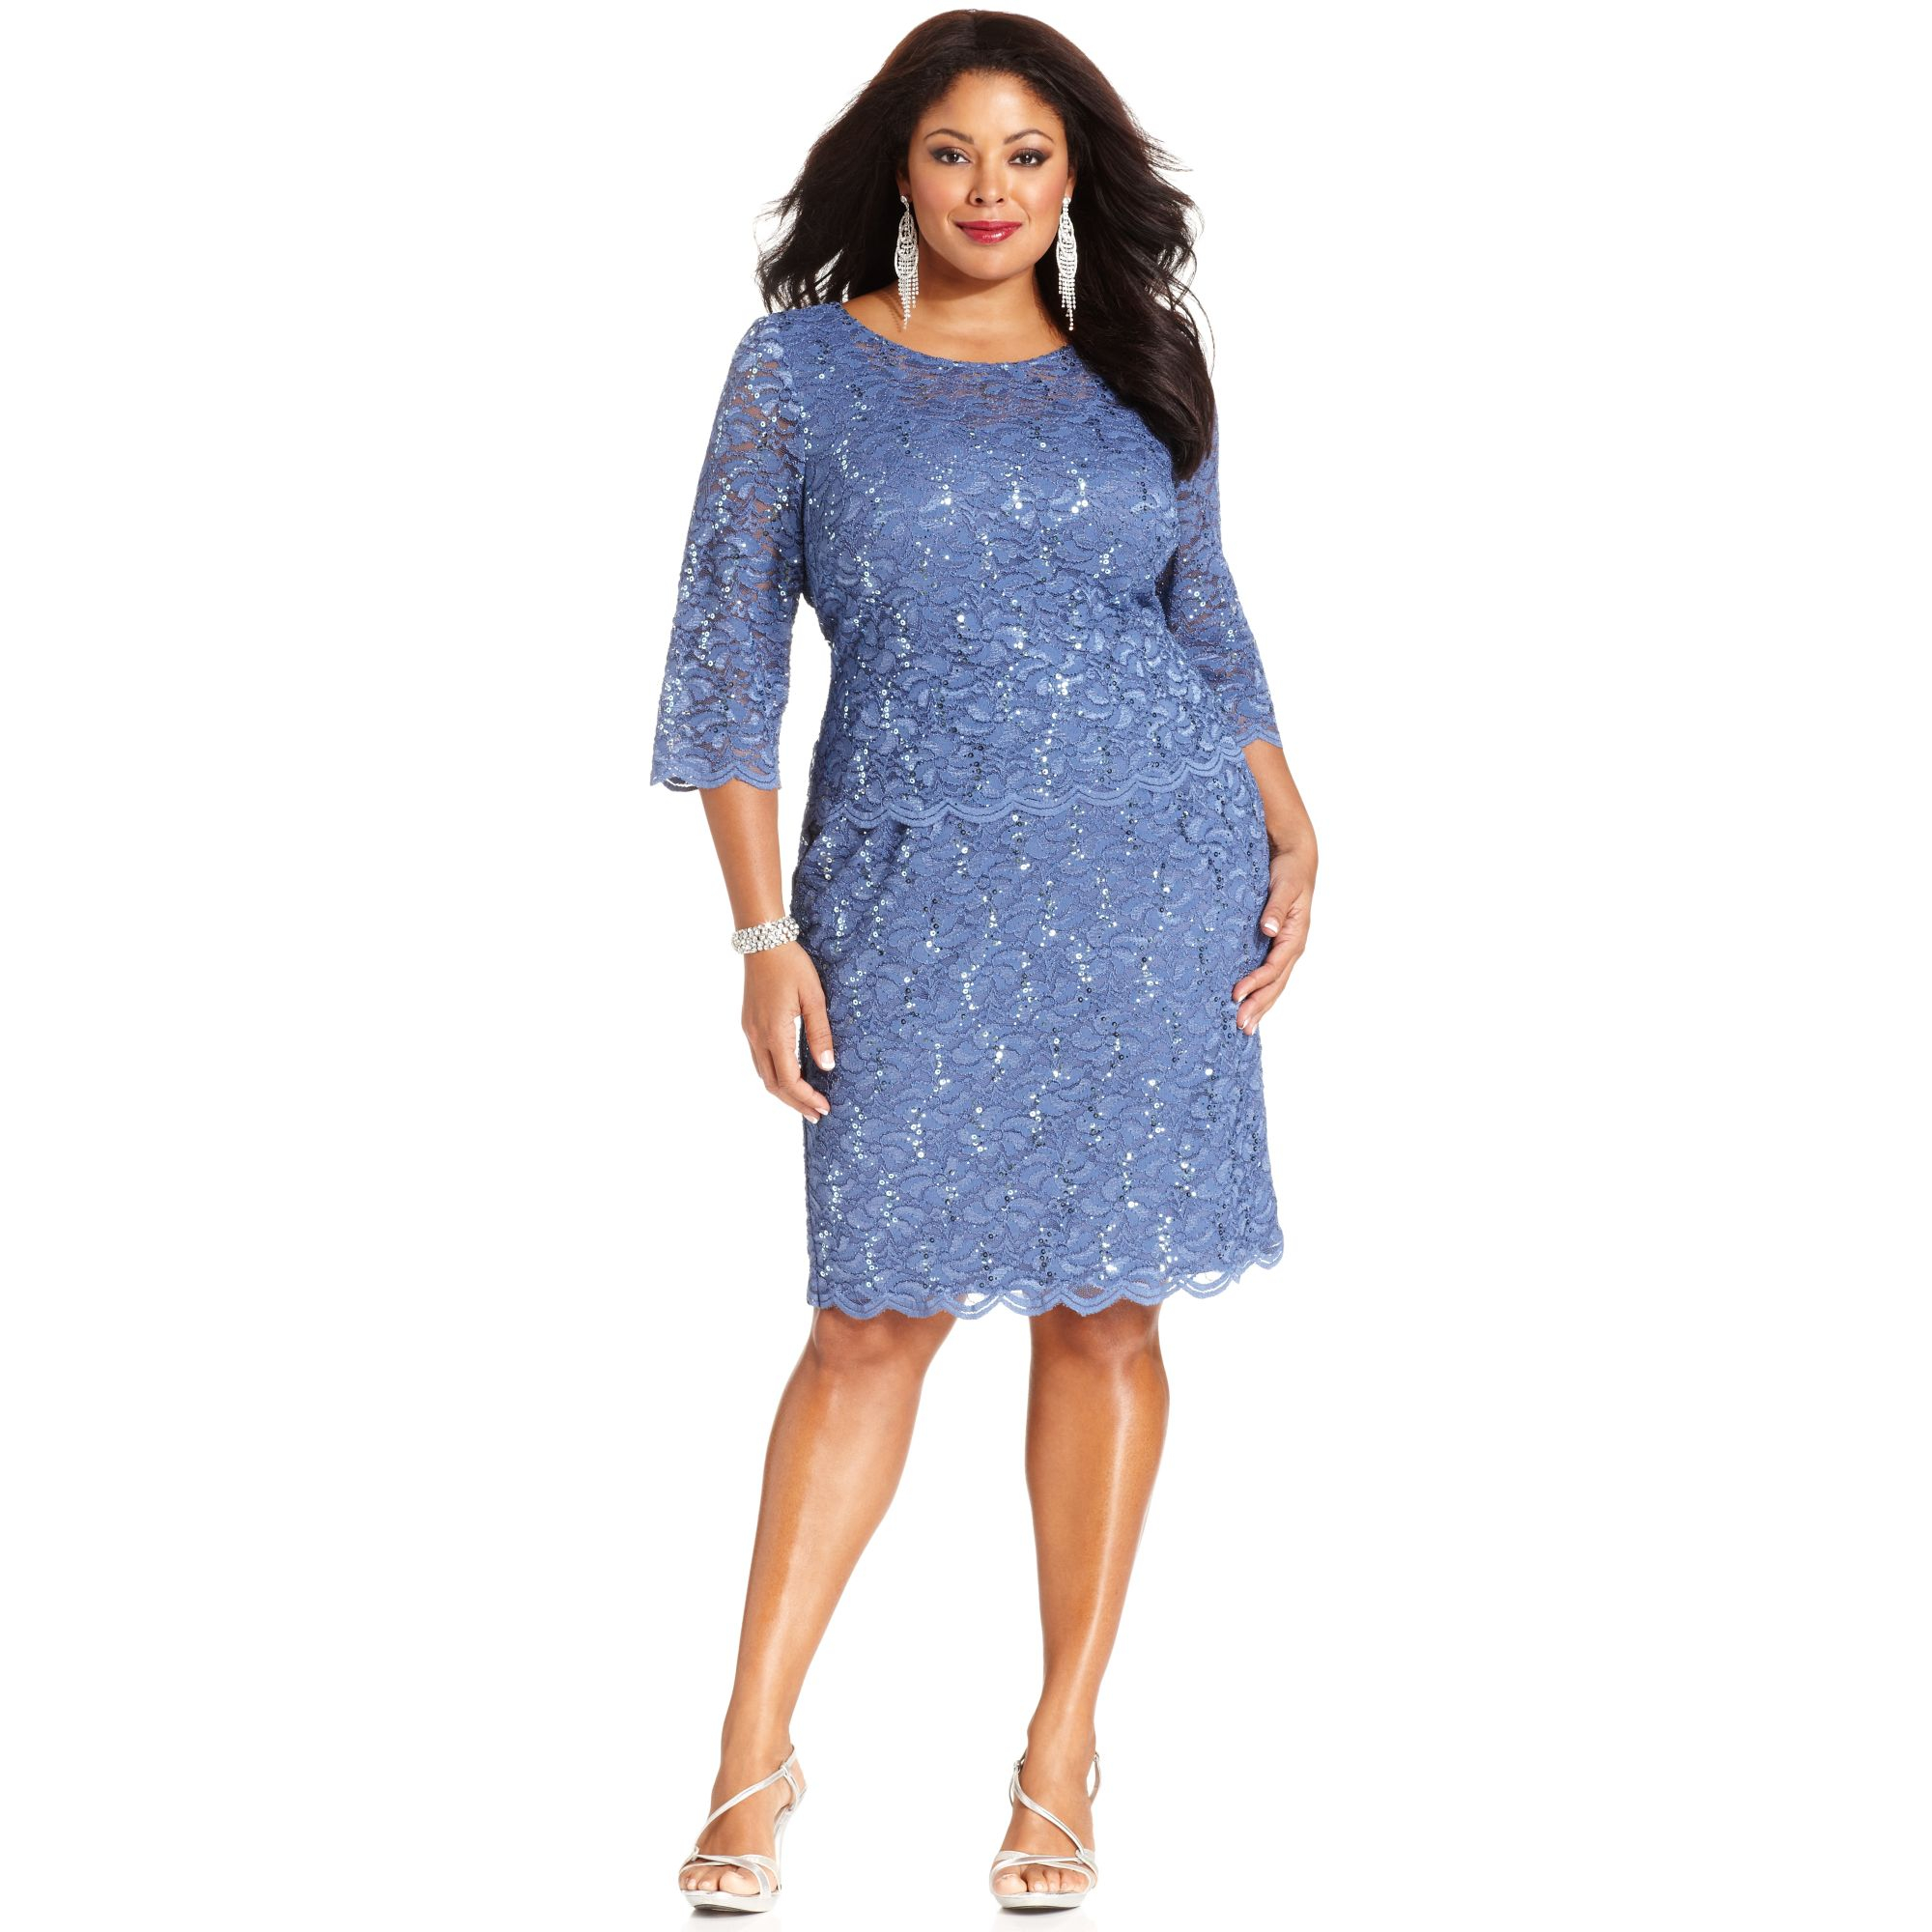 Plus Size Sequined Lace Dress